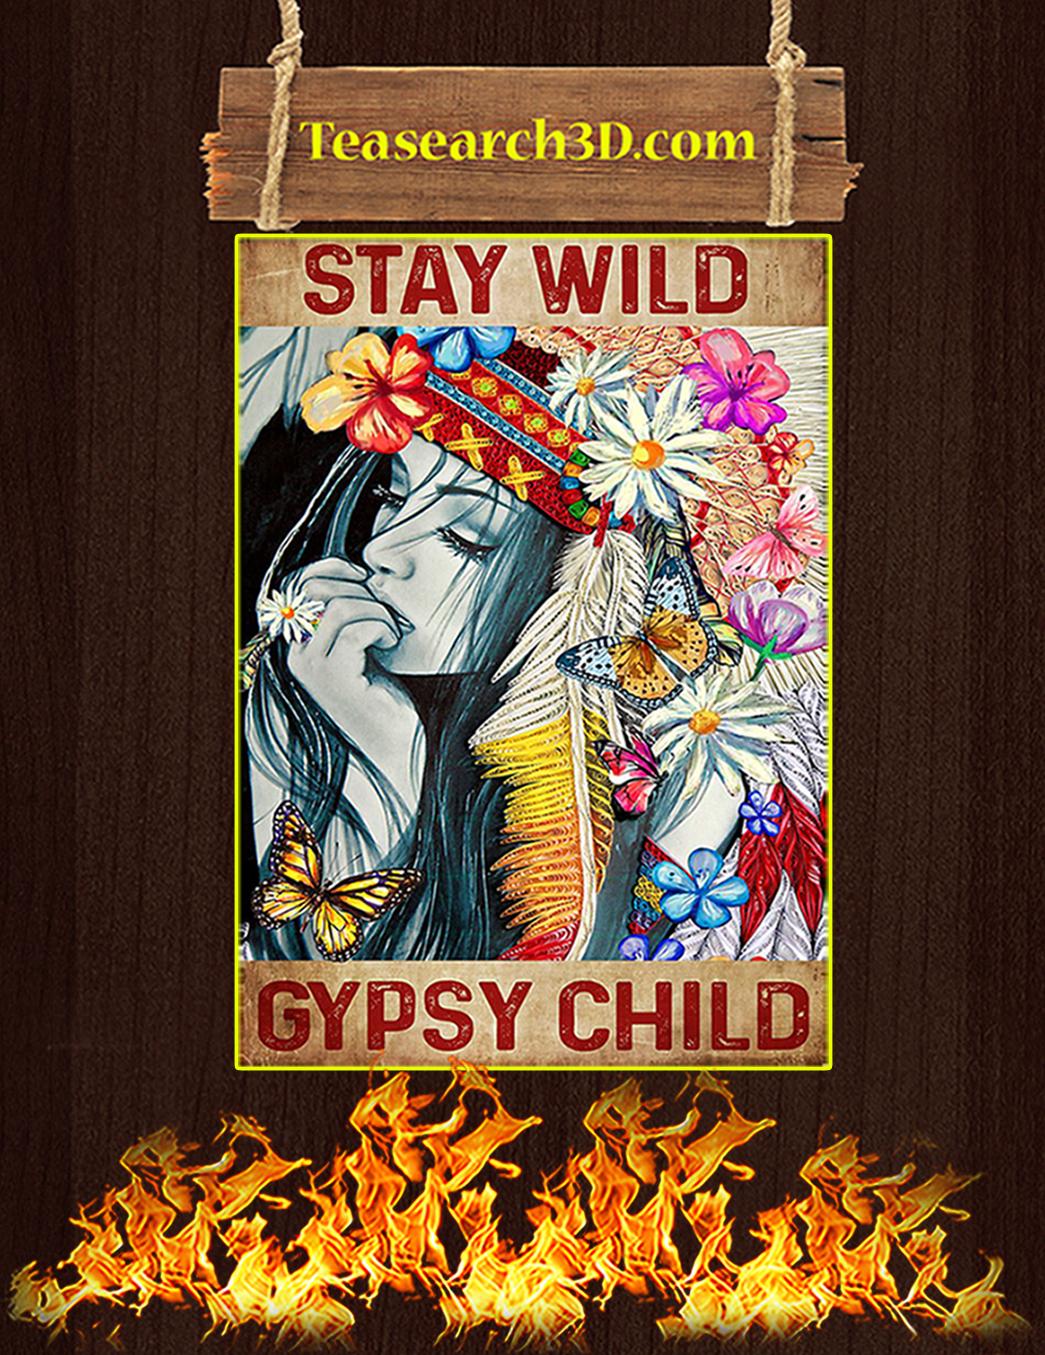 Hippie stay wild gypsy child poster A1